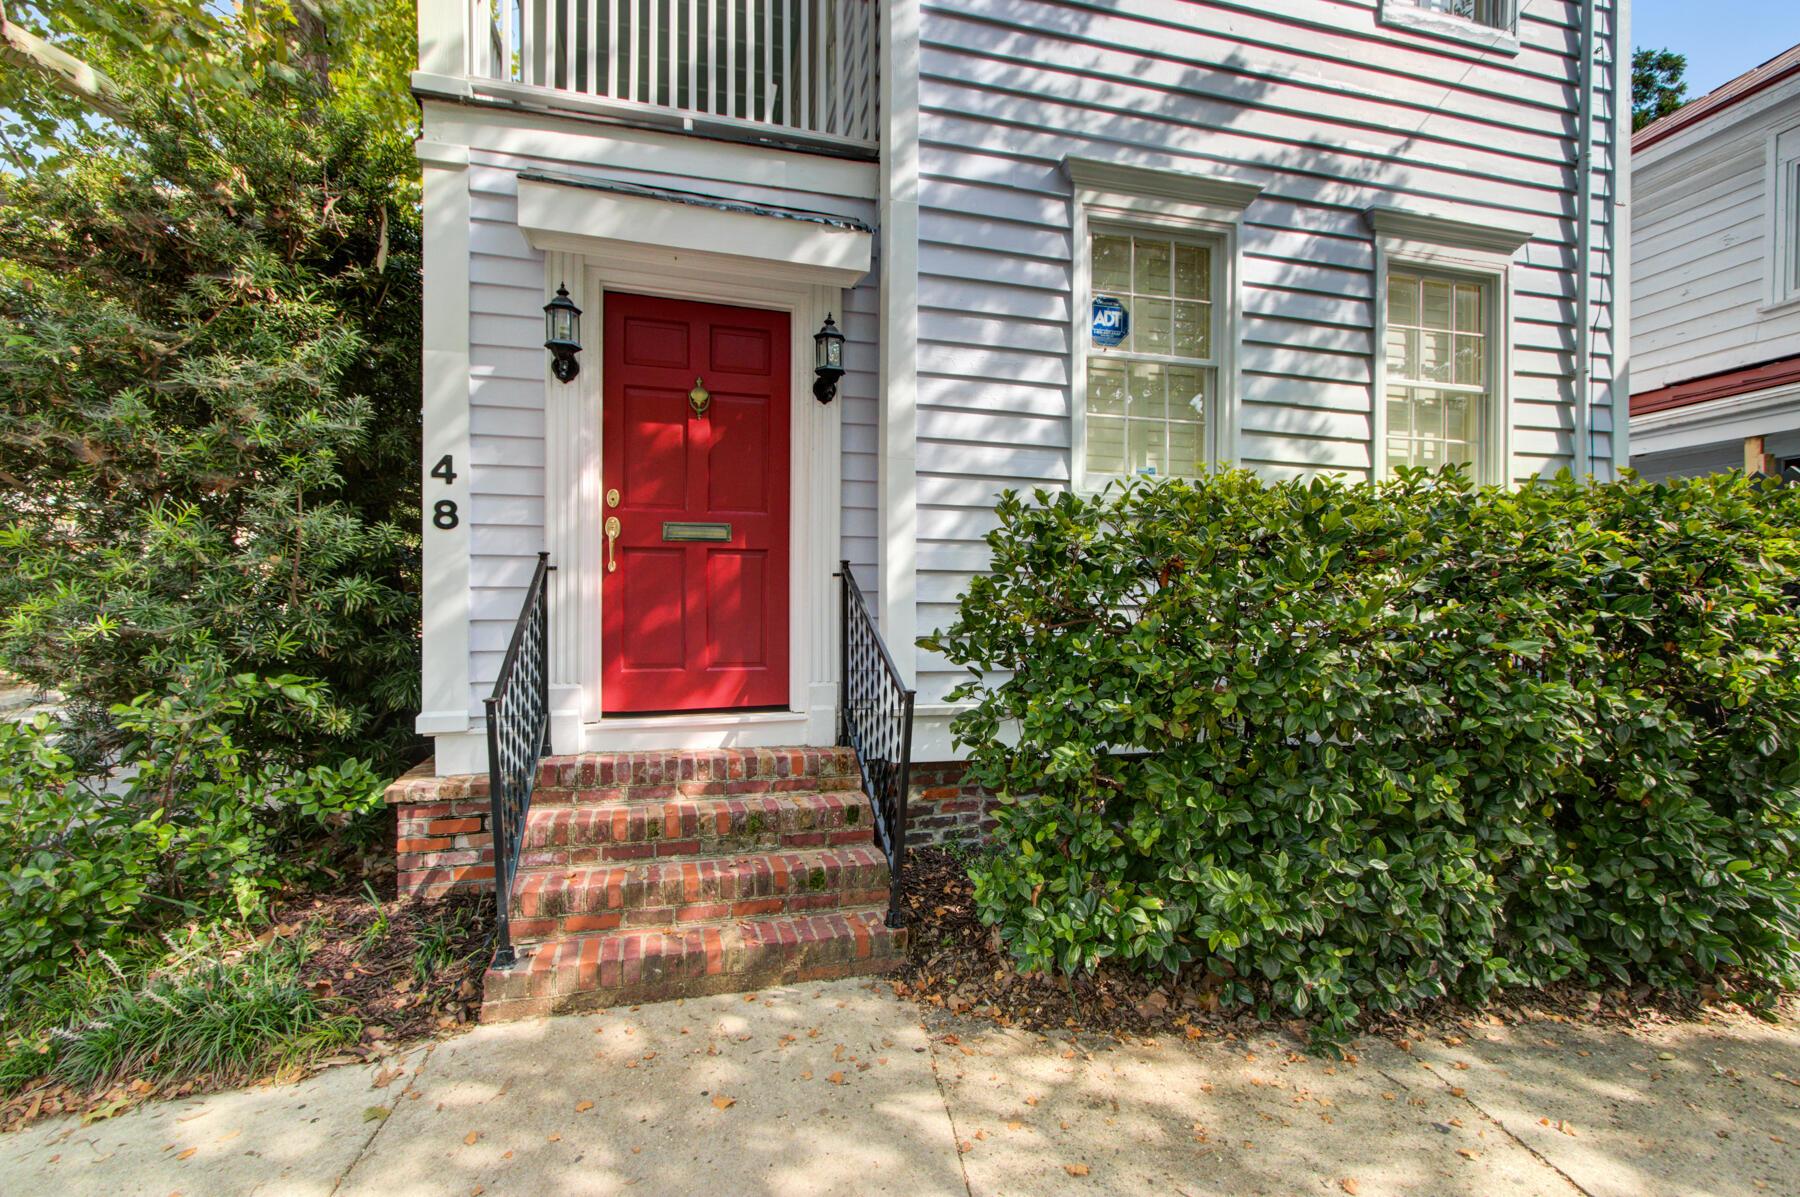 Radcliffeborough Homes For Sale - 48 Radcliffe, Charleston, SC - 20